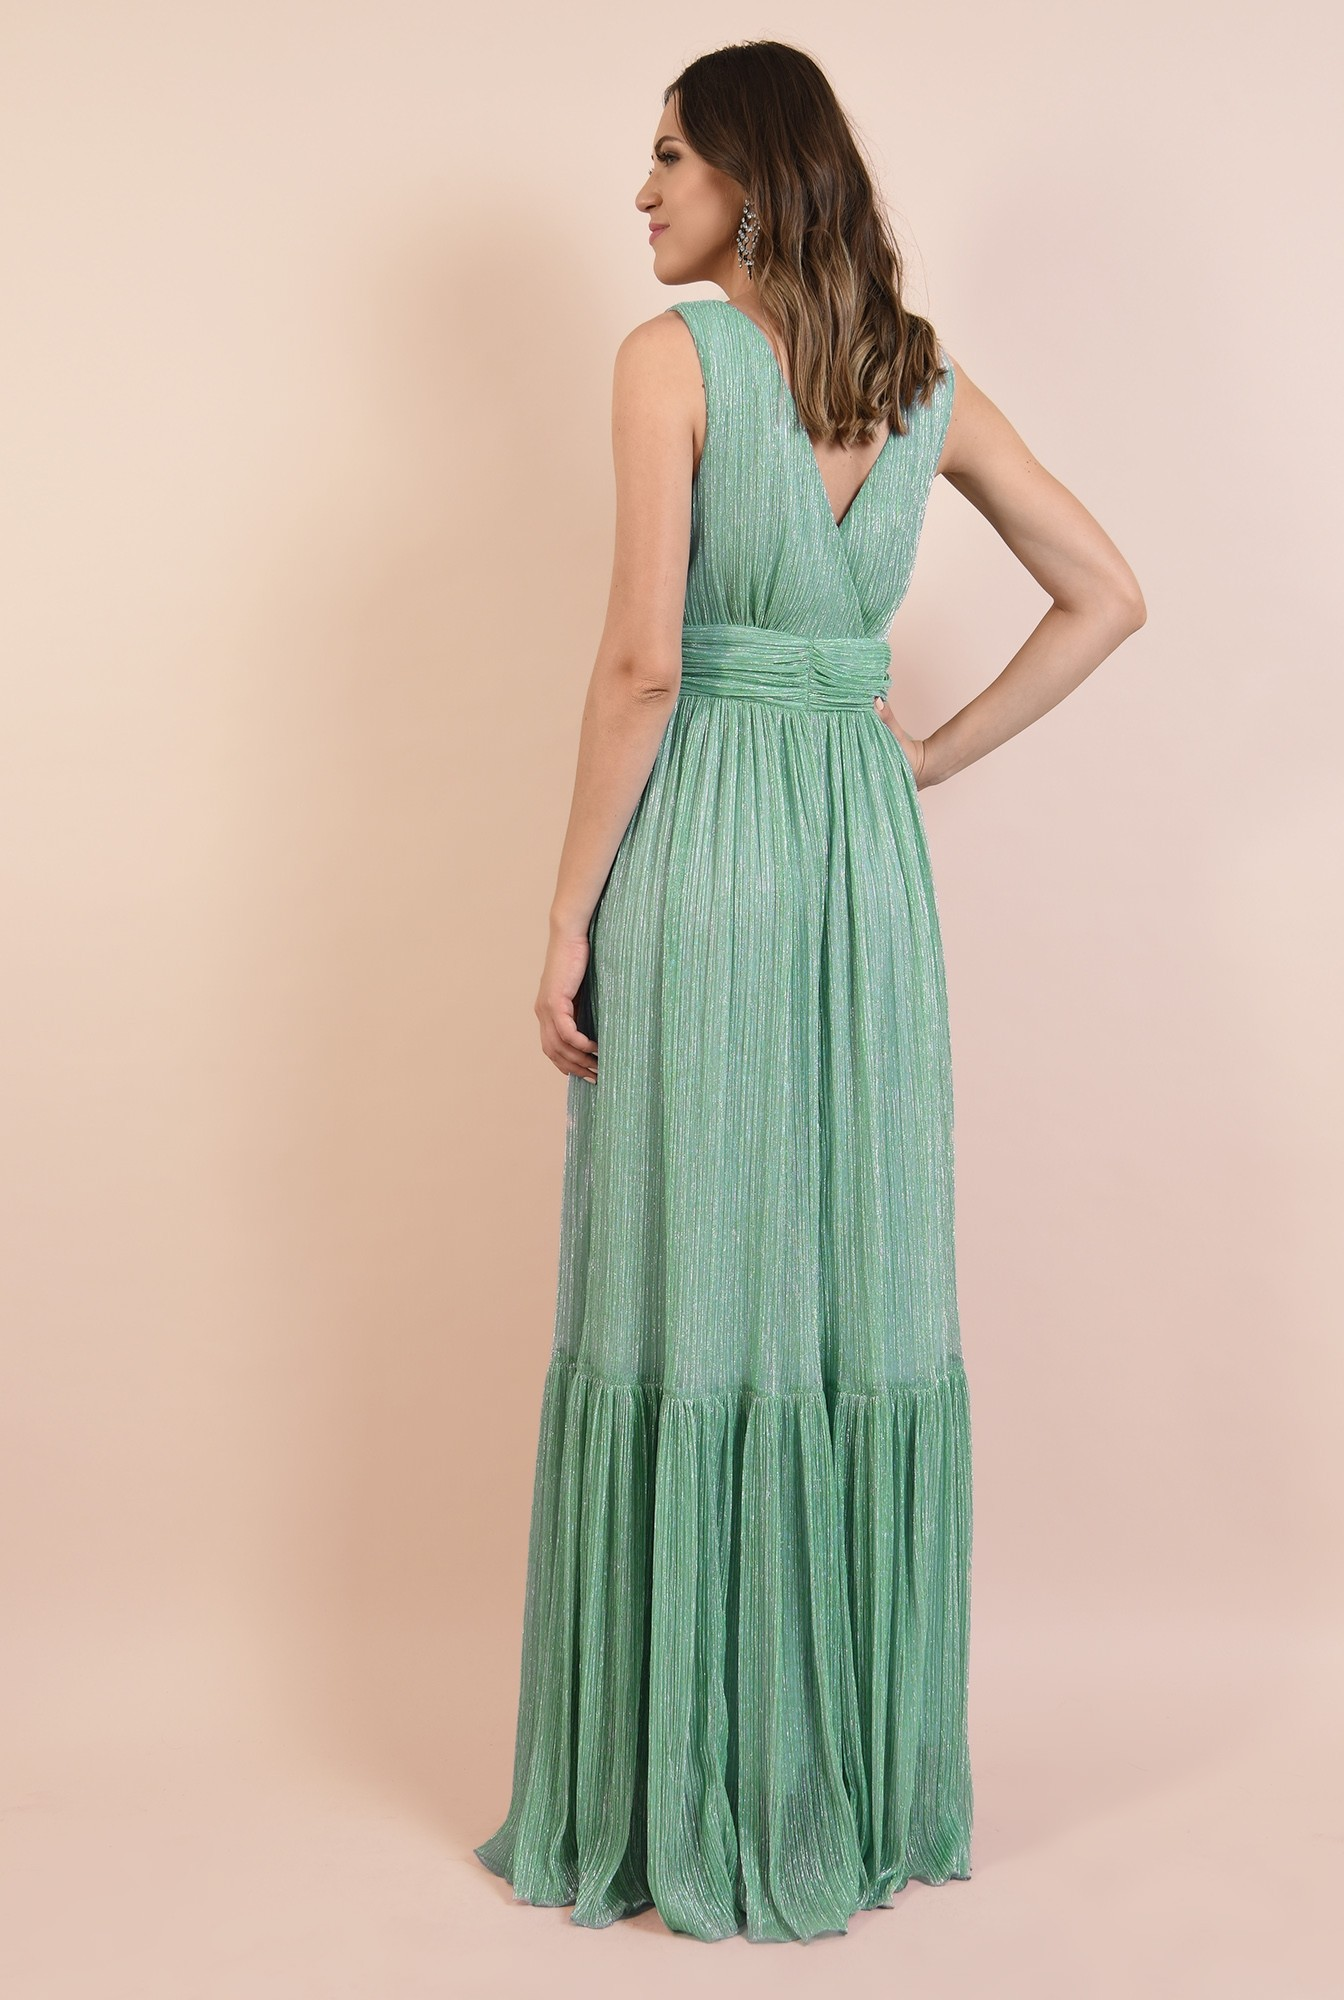 1 - rochie de seara, lunga, lurex, verde menta, volan la baza, Poema